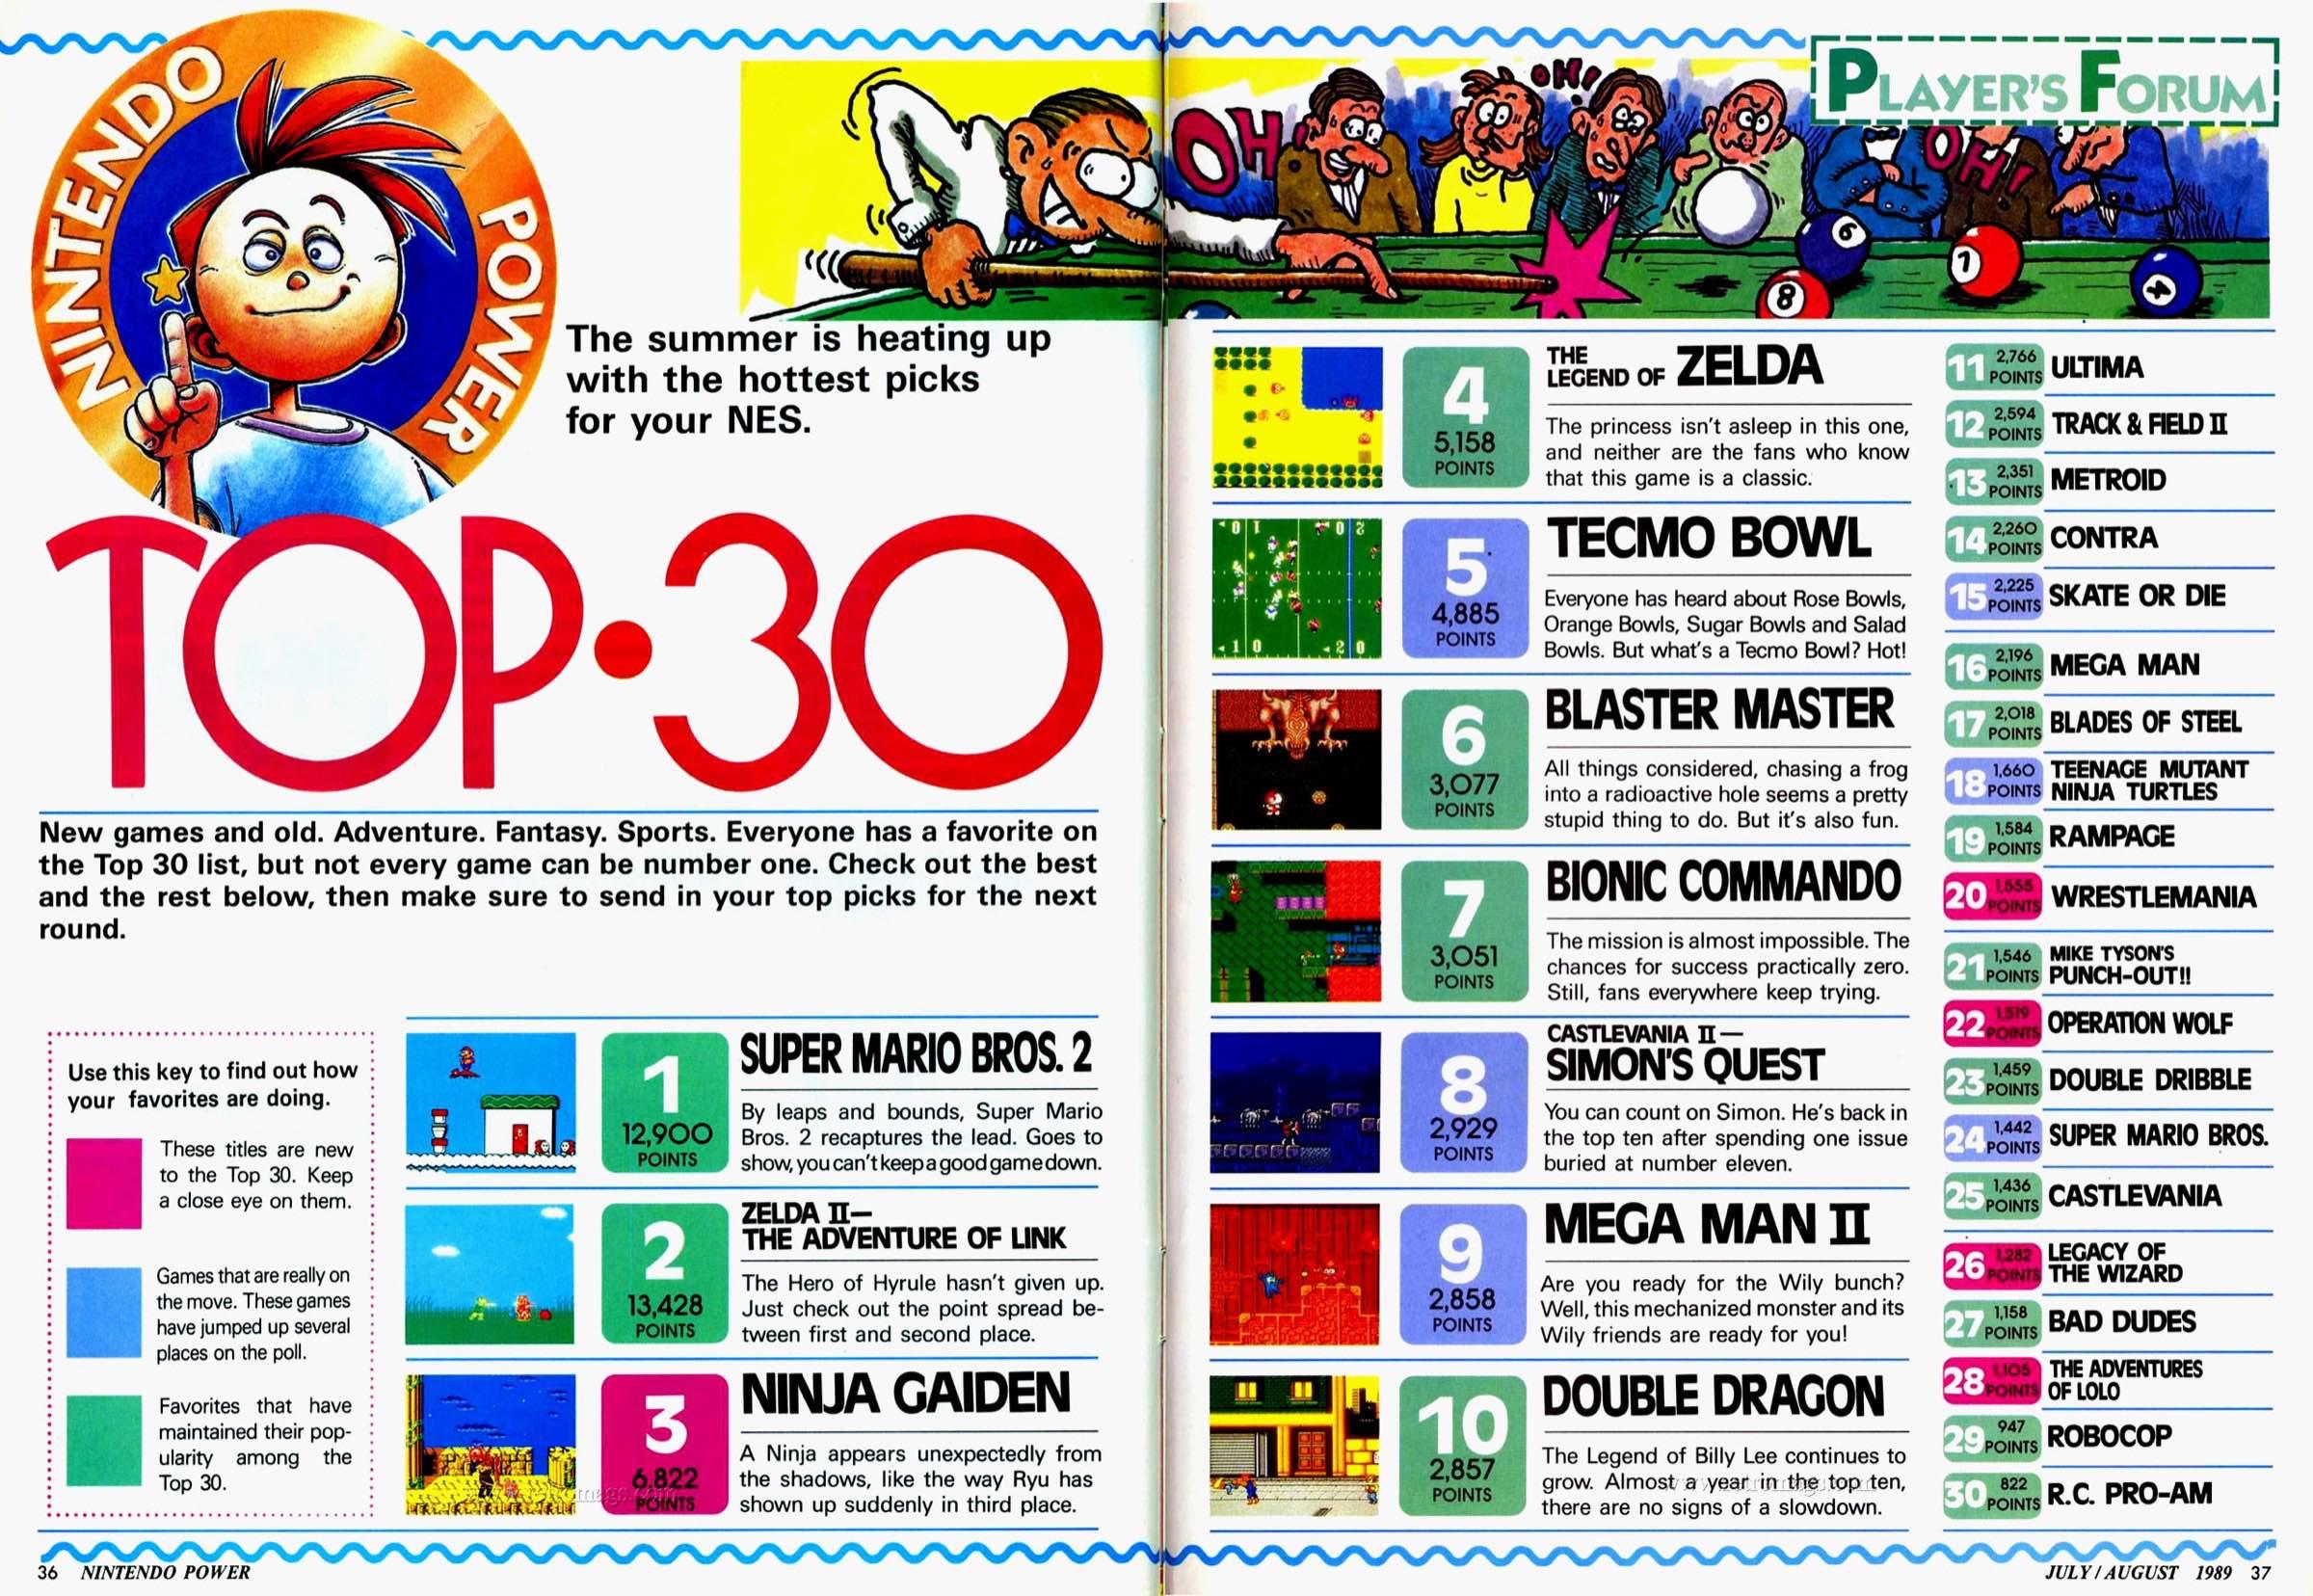 Nintendo Power | July August 1989 p36-37